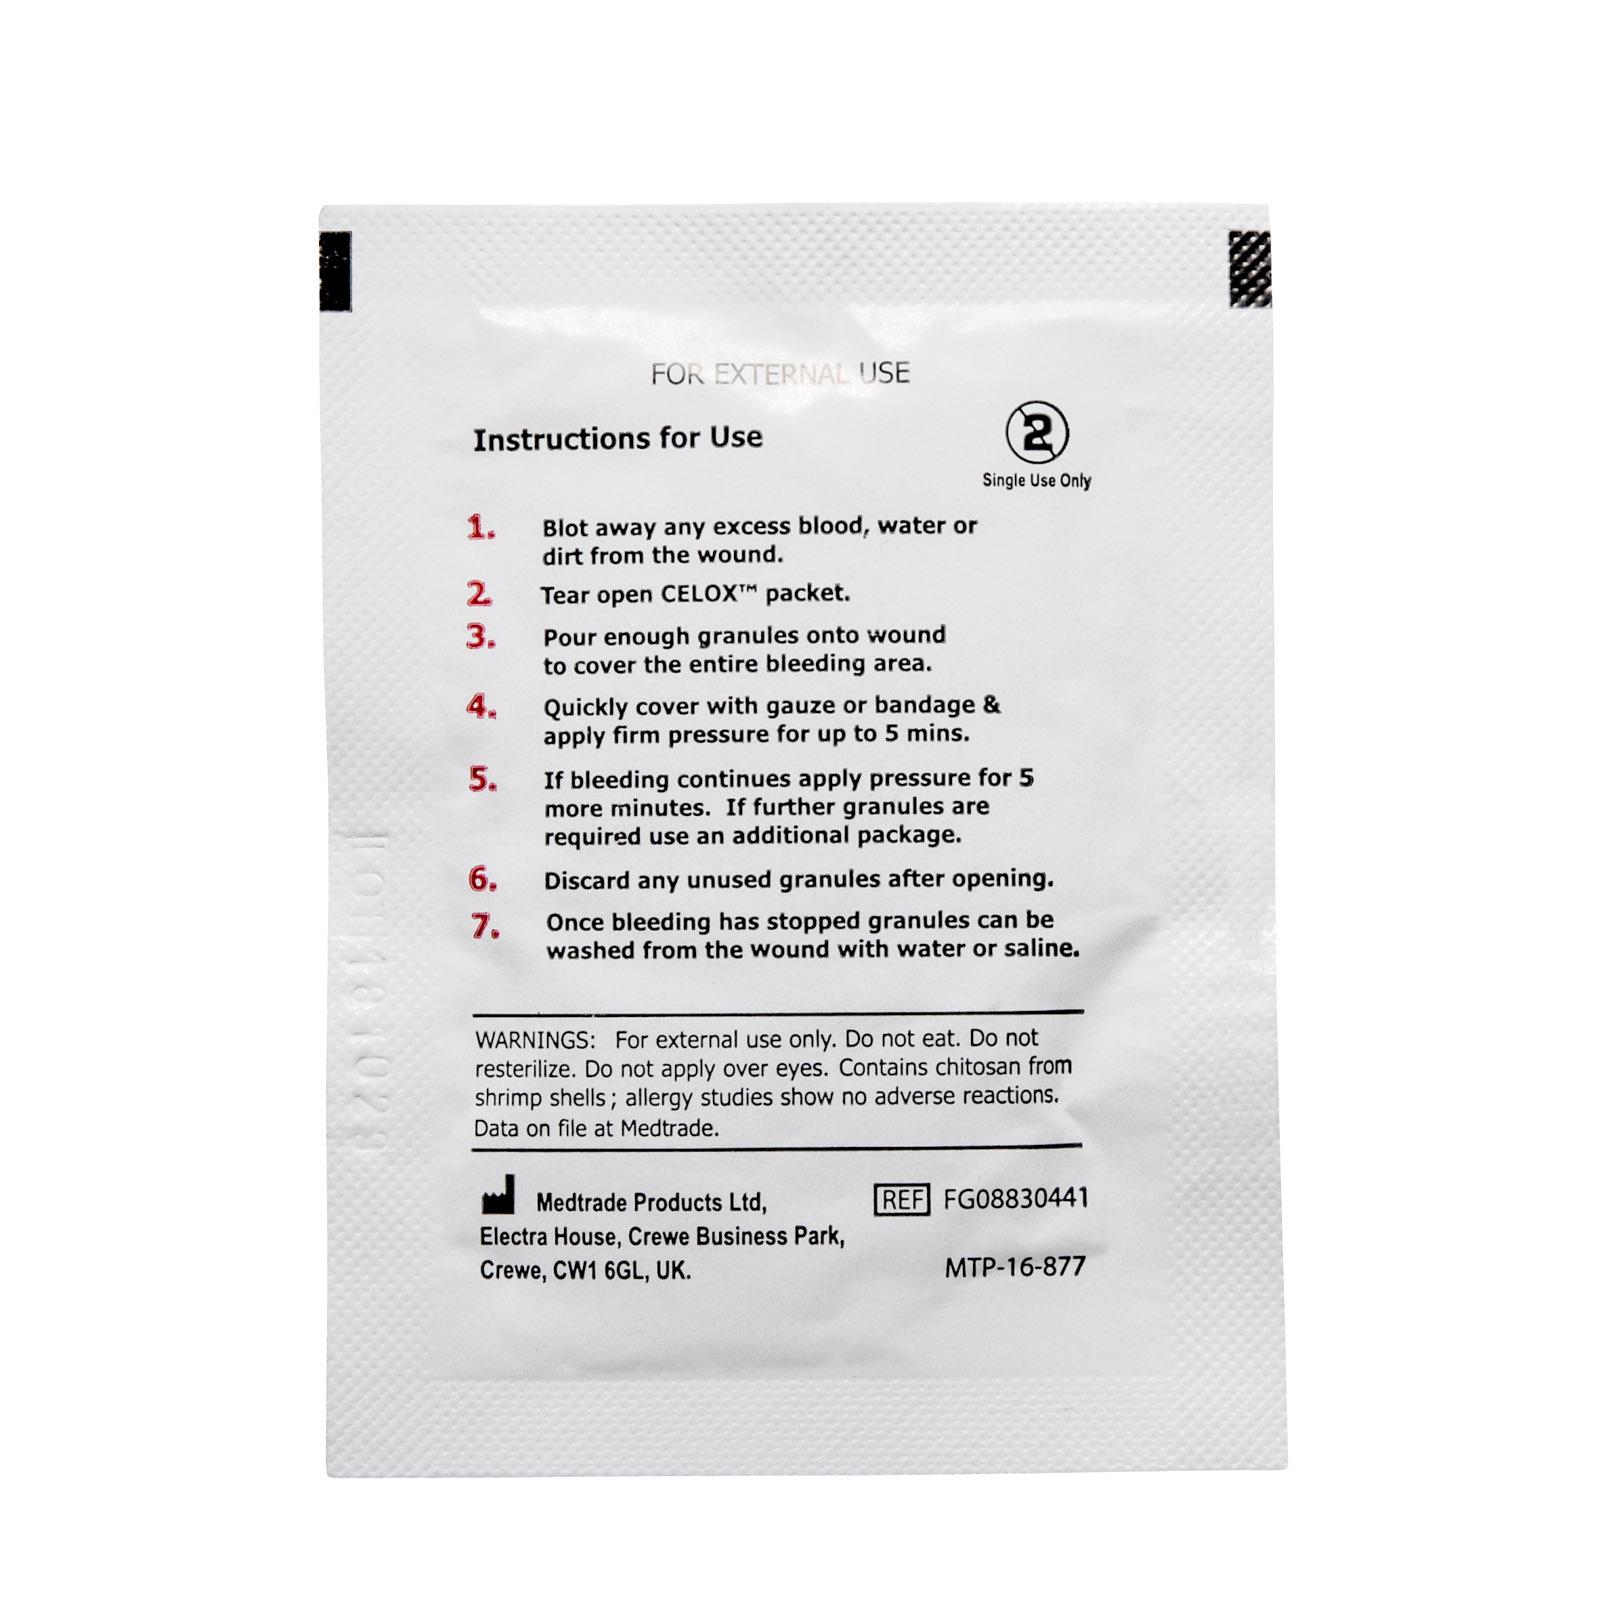 Celox Bleeding Control Granules | MFASCO Health & Safety